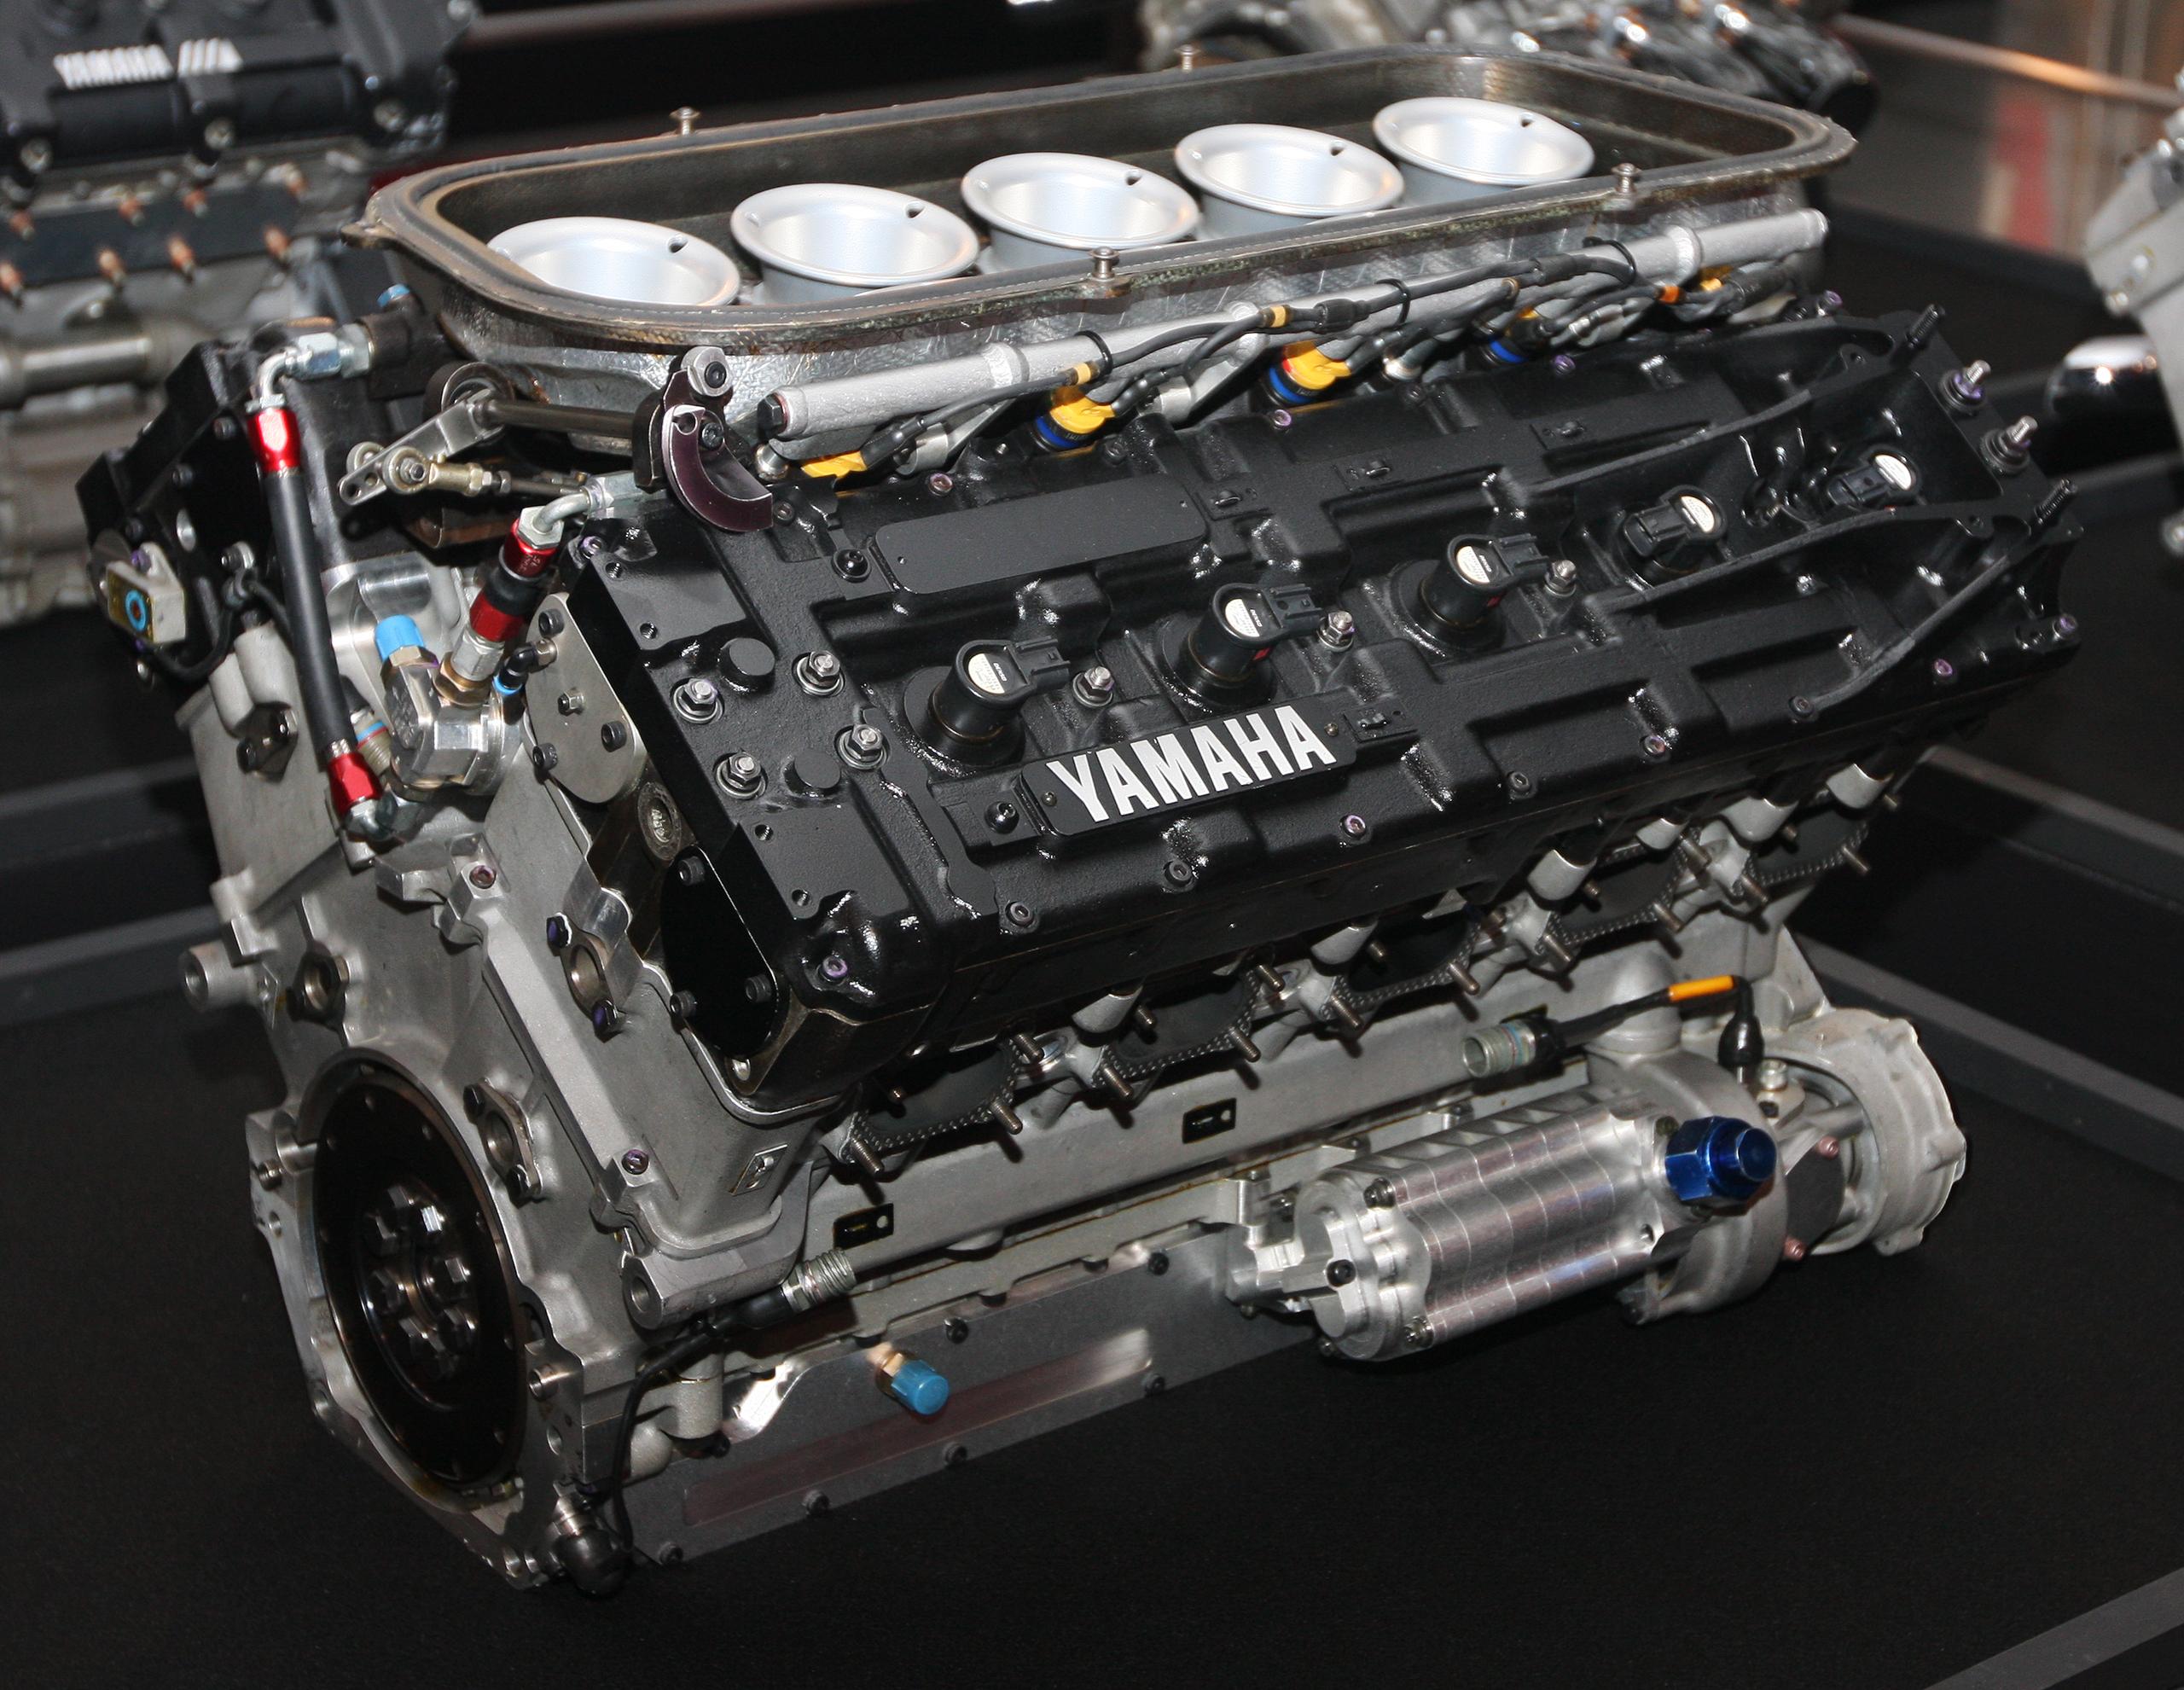 File:Yamaha OX10A engine rear.jpg - Wikimedia Commons